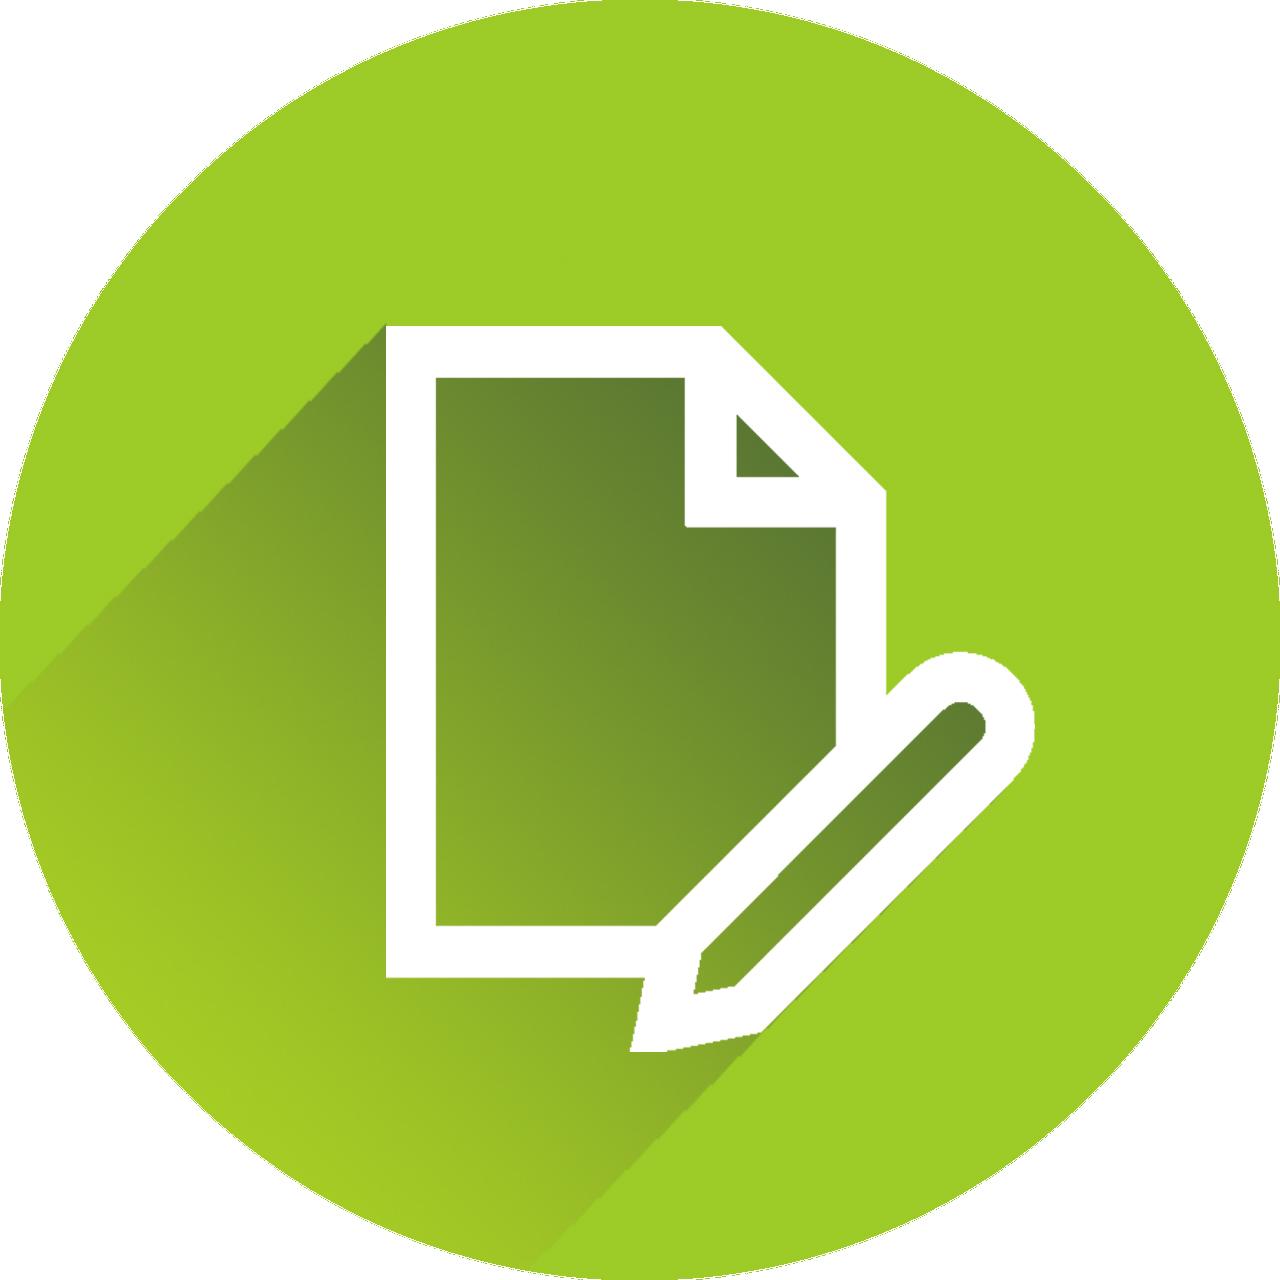 HTML voor inleidende en afsluitende tekst